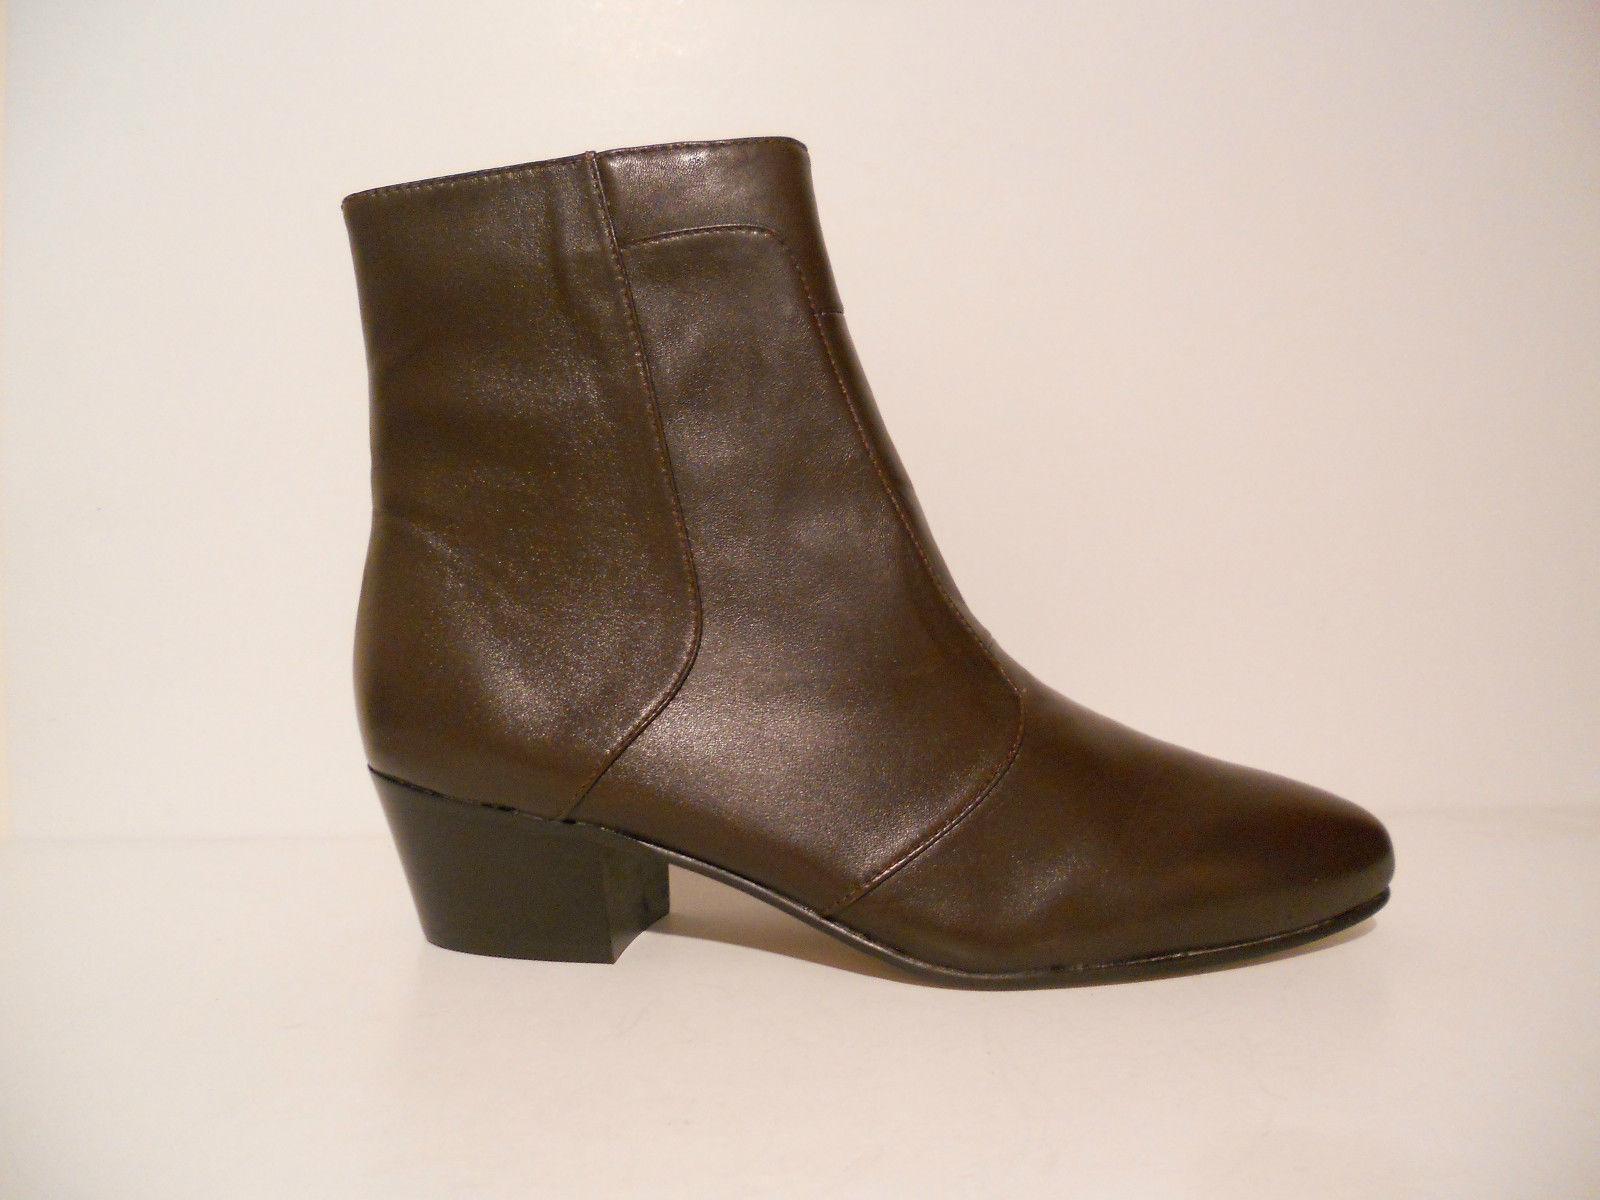 Giorgio Boots Brutini Mens Calloway 80575 Leather Cuban Heel Boots Giorgio Dark Brown 6.5 -15 51a61b